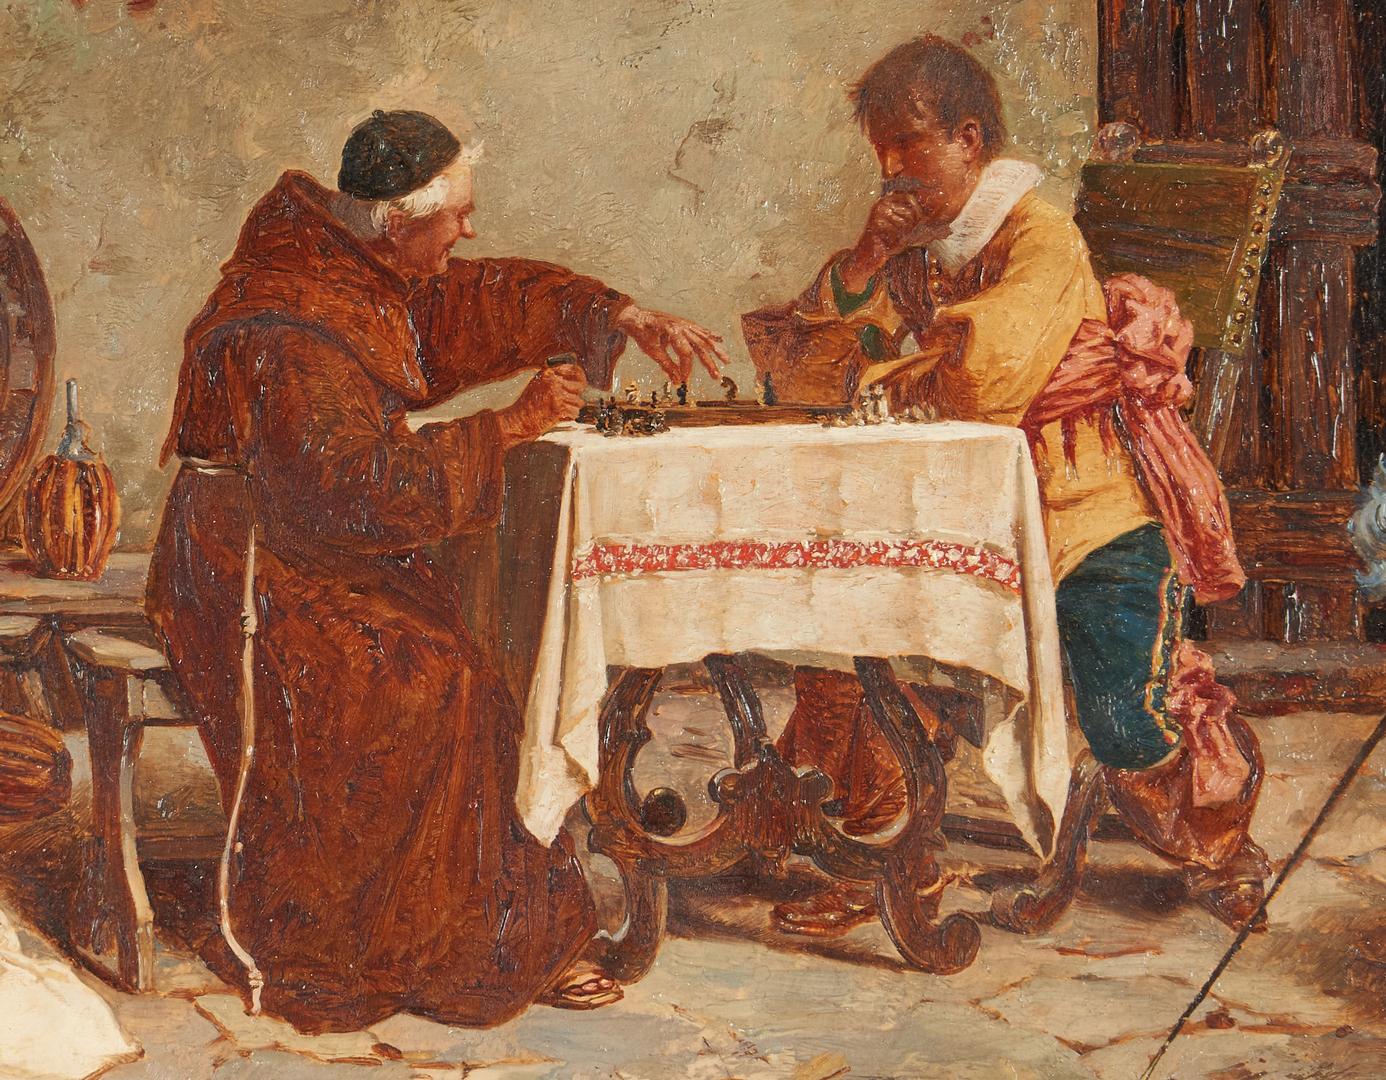 Lot 305: Attrib. Alessandro Sani, O/B, The Chess Game